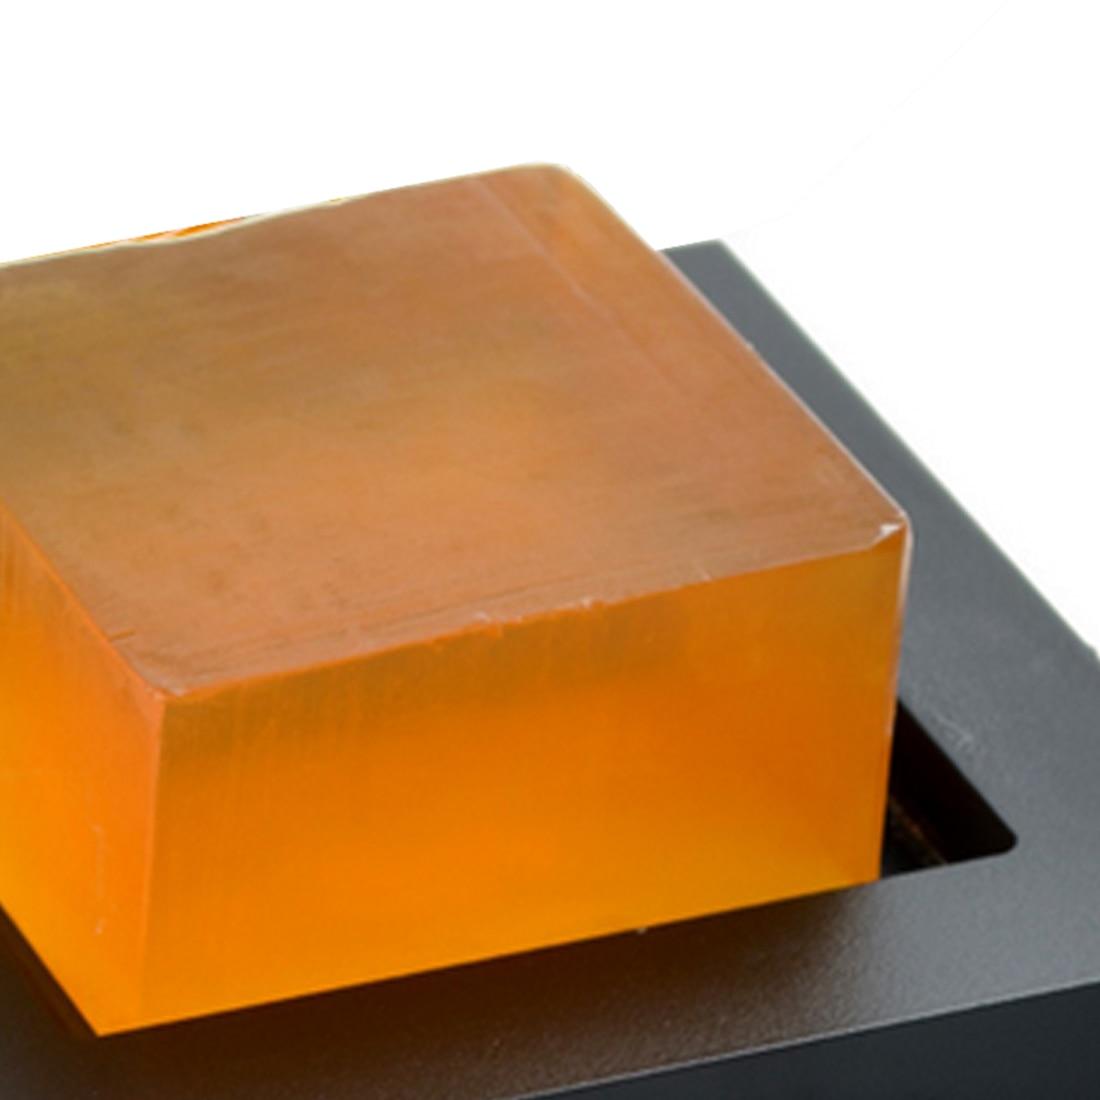 Newest 100% HandMade Whitening Peeling Glutathione Arbutin Honey Kojic Acid Soap 100g